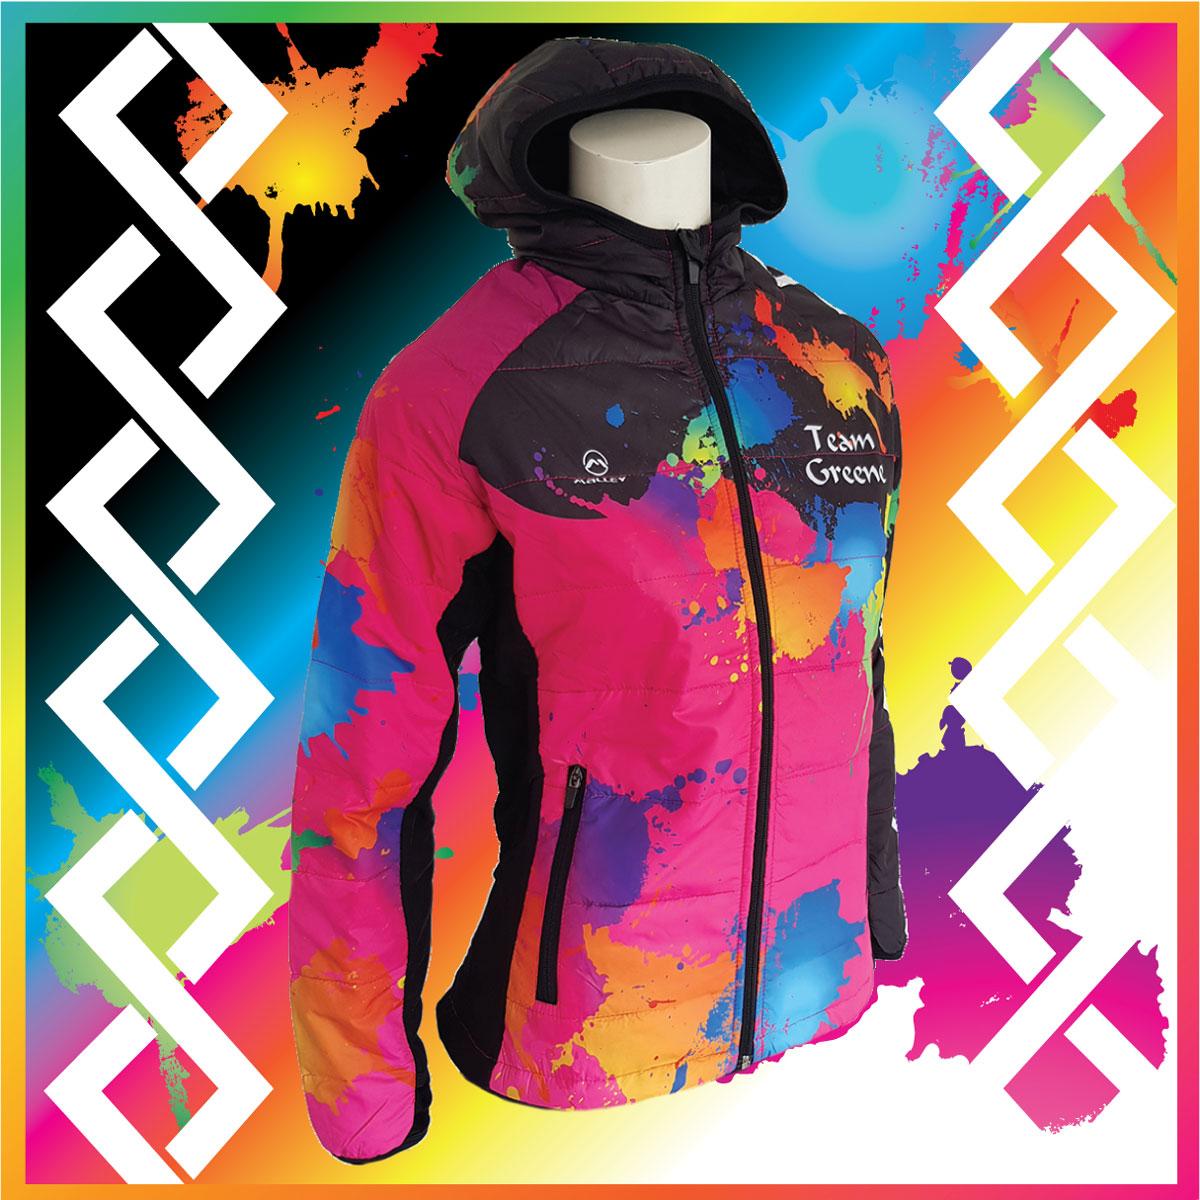 GREENE_puffa_jacket_side2_design.jpg